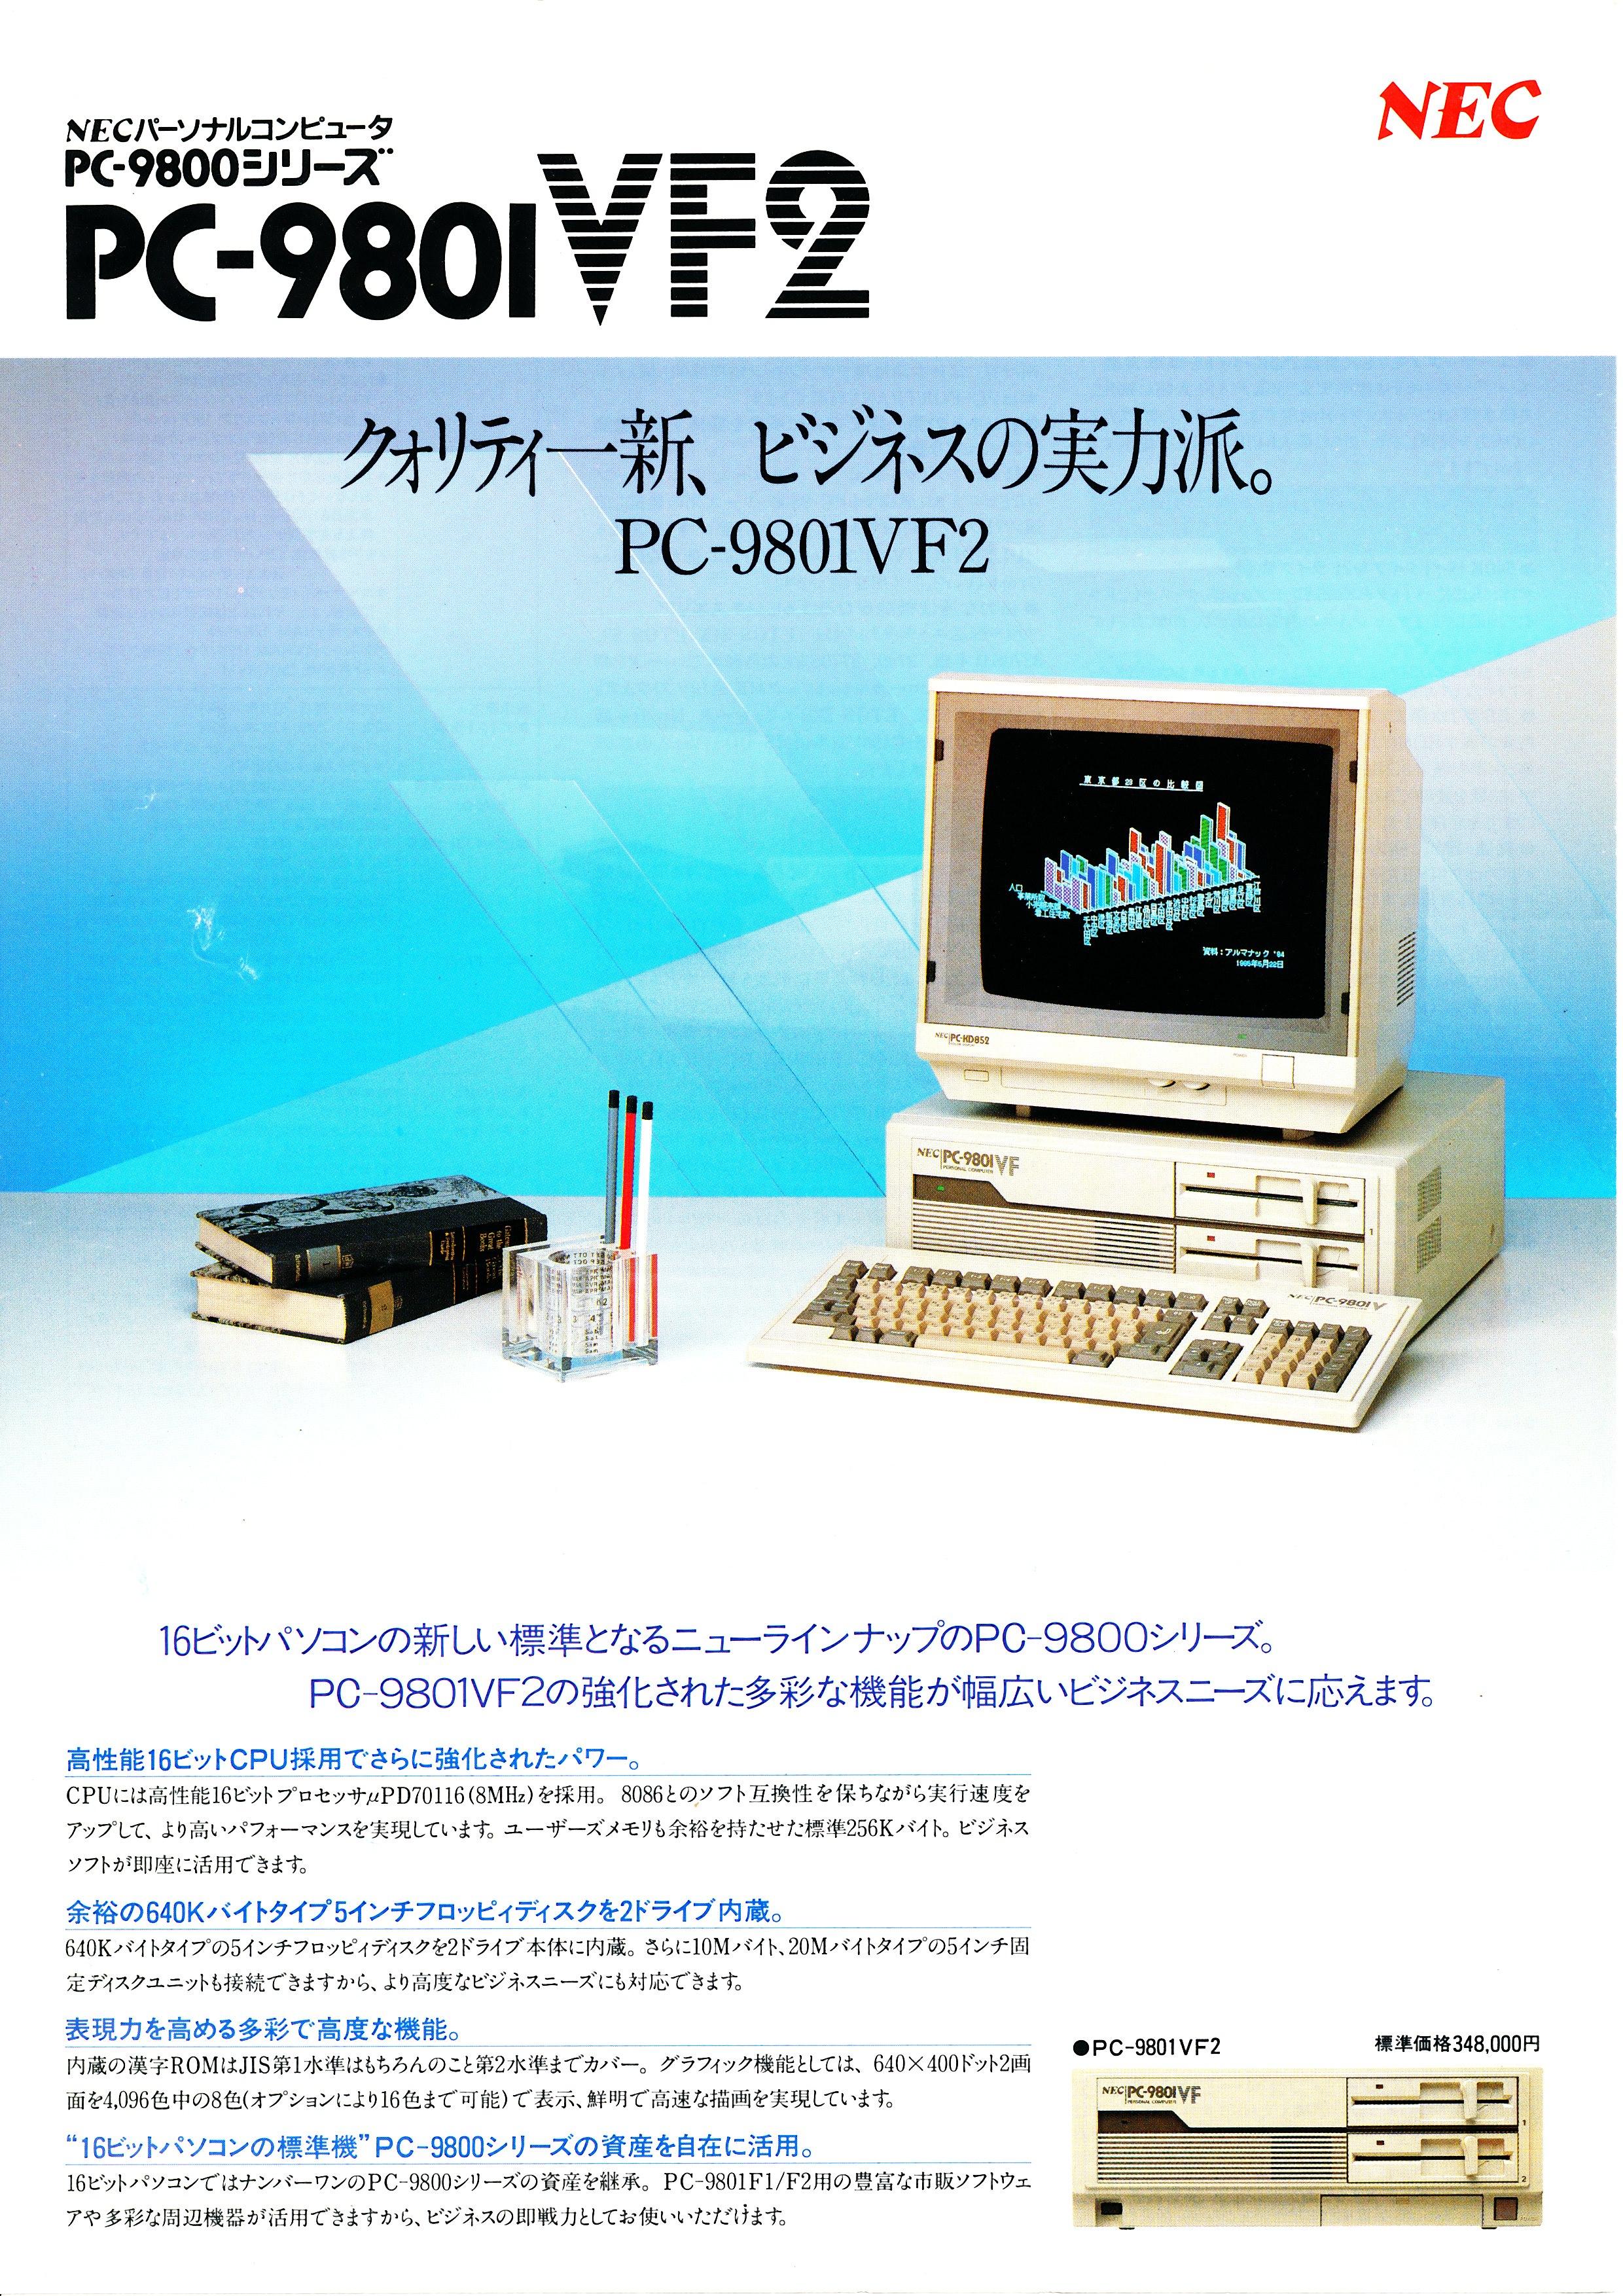 PC-9801VF2 P1